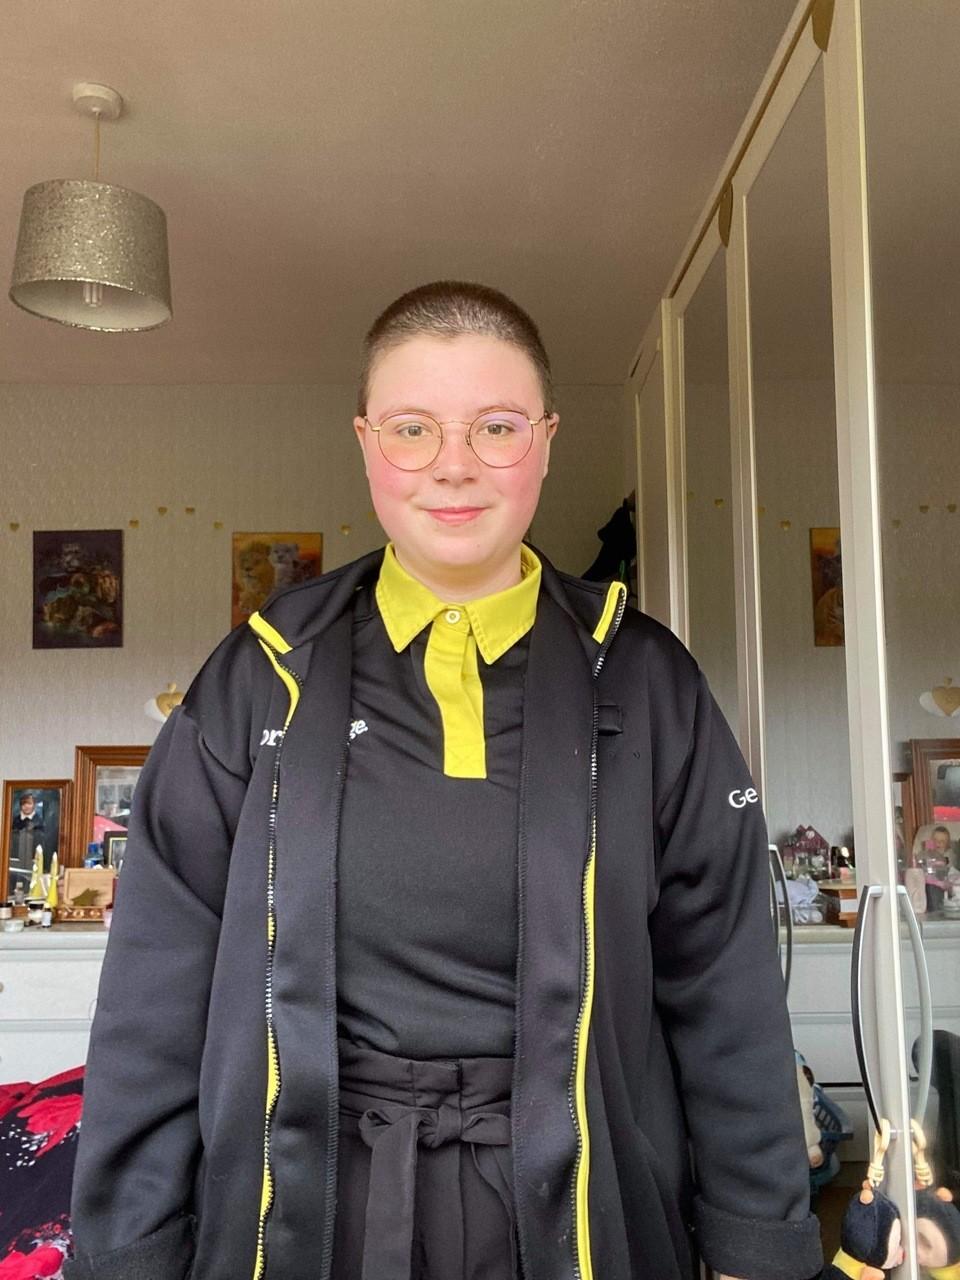 Chloe shaves her head | Asda Rugby